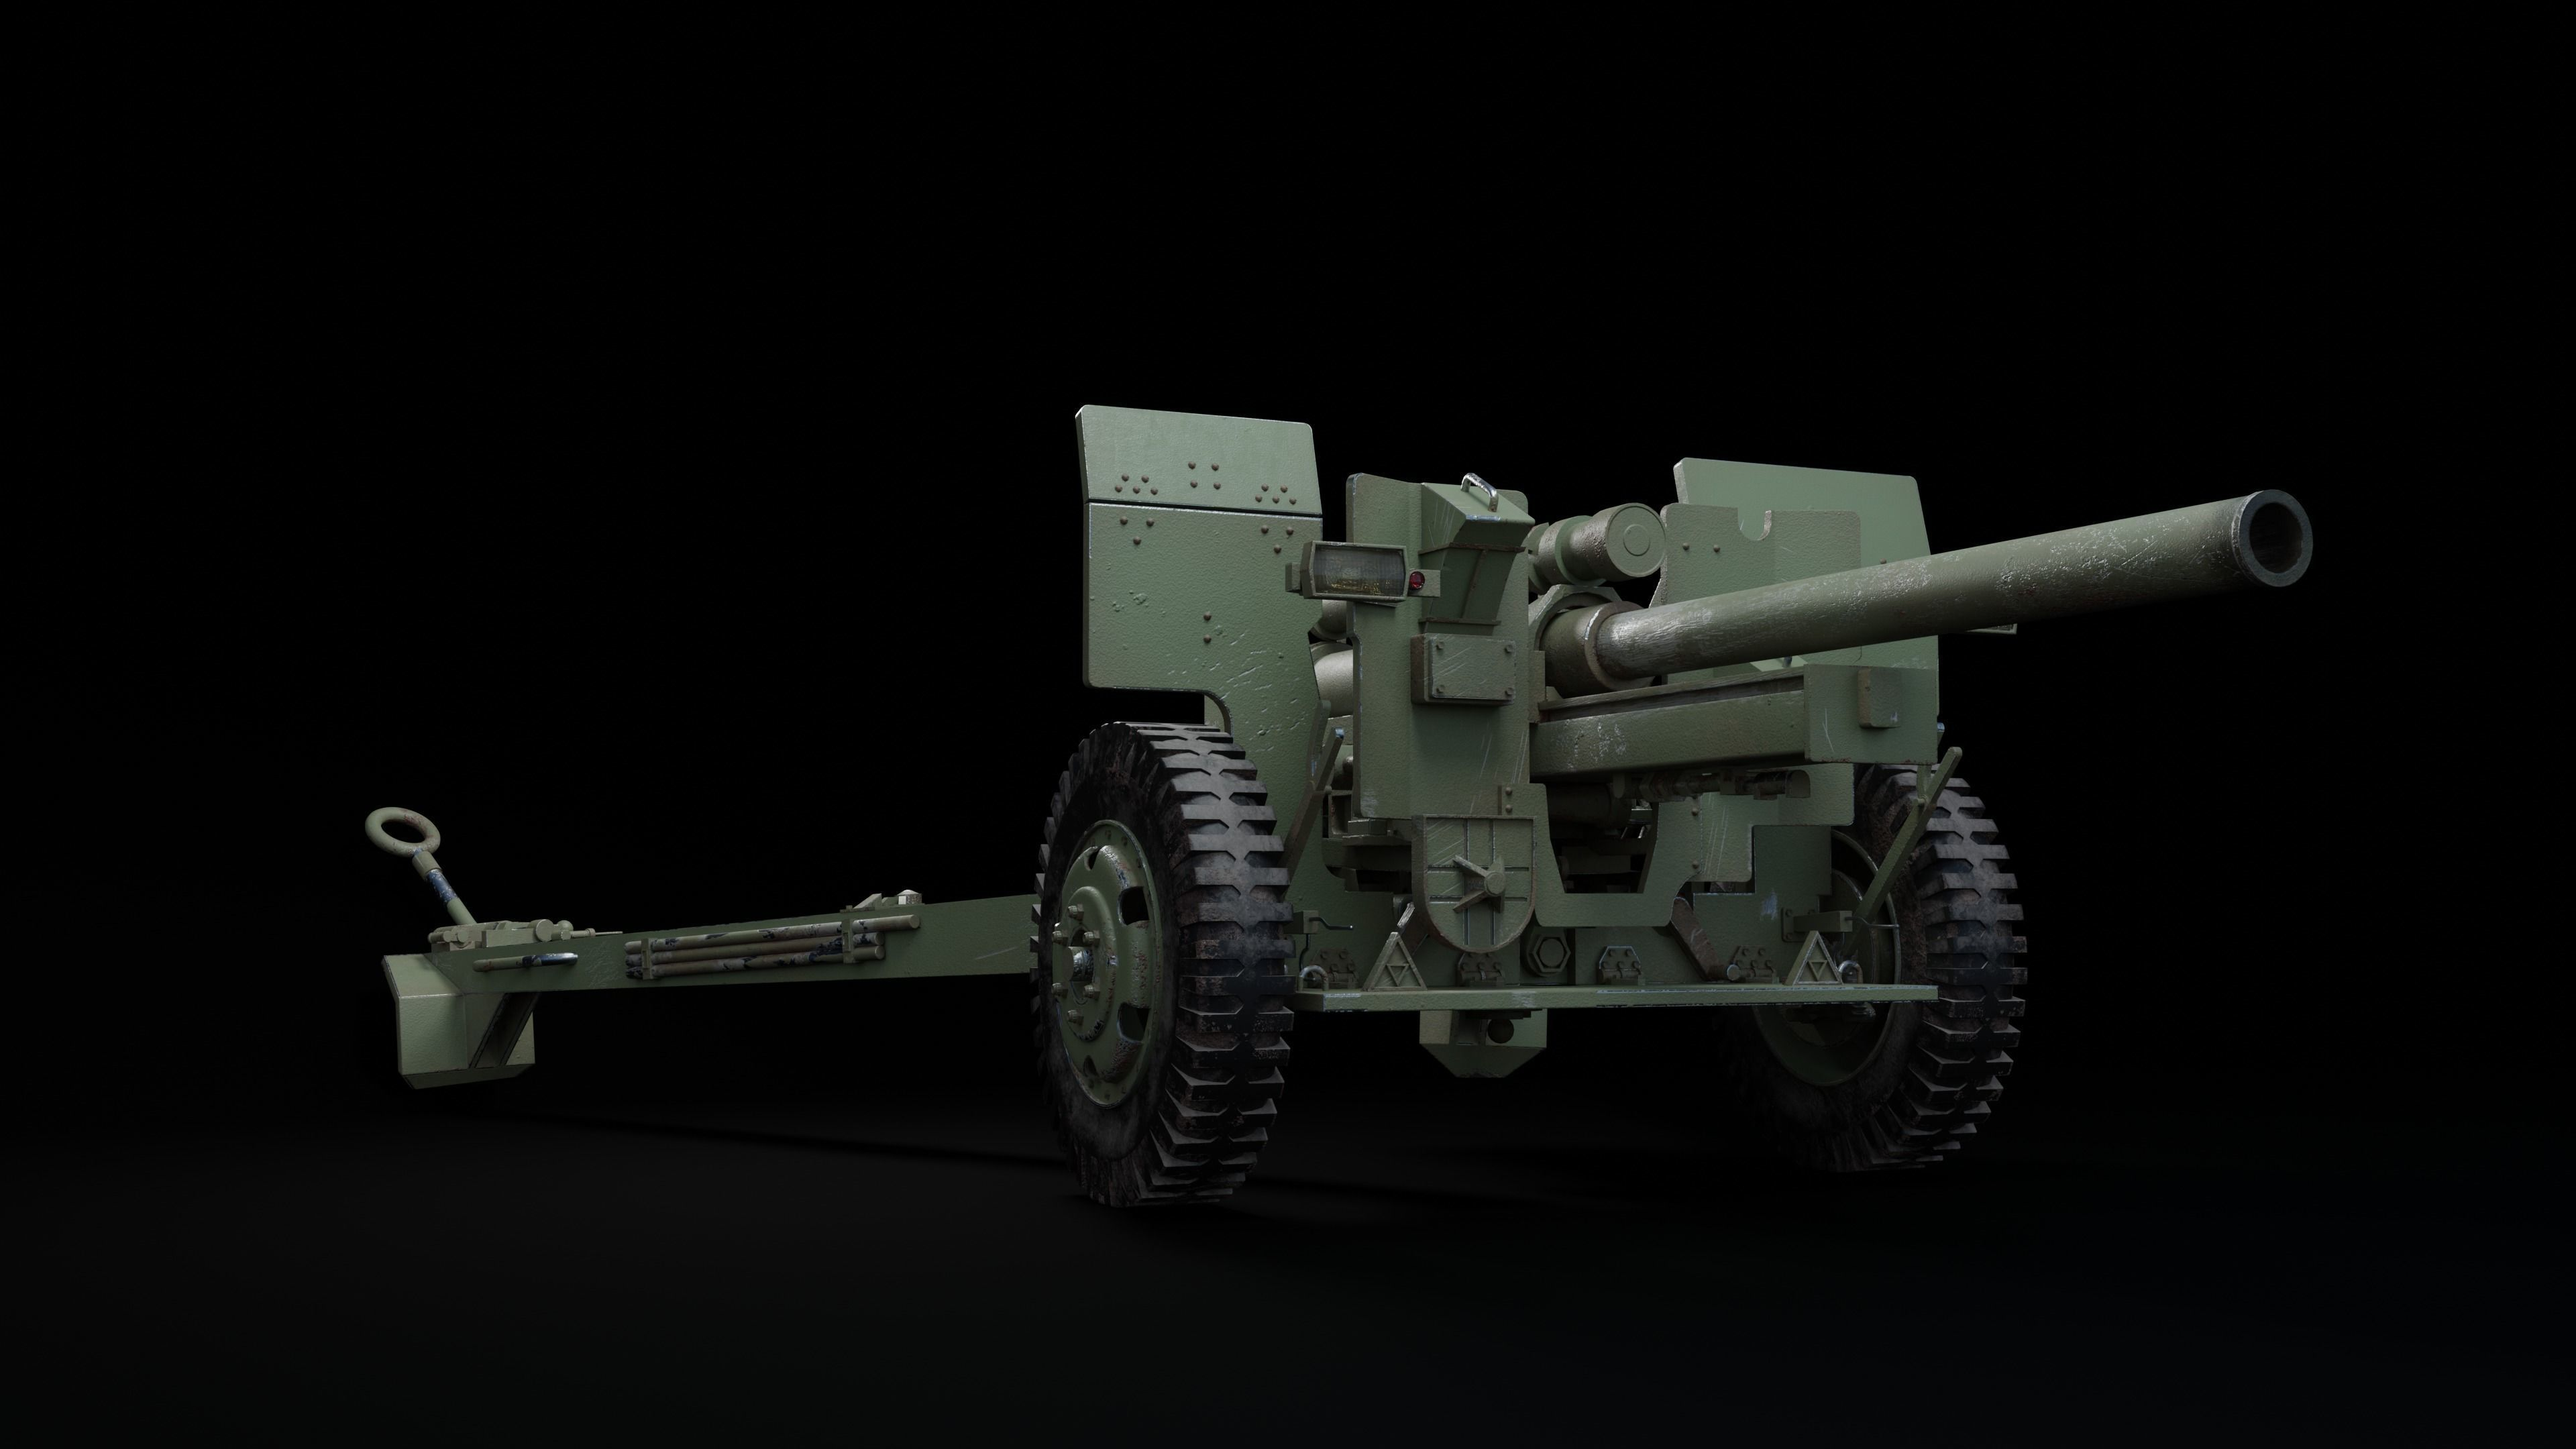 Weapon howitzer 105mm